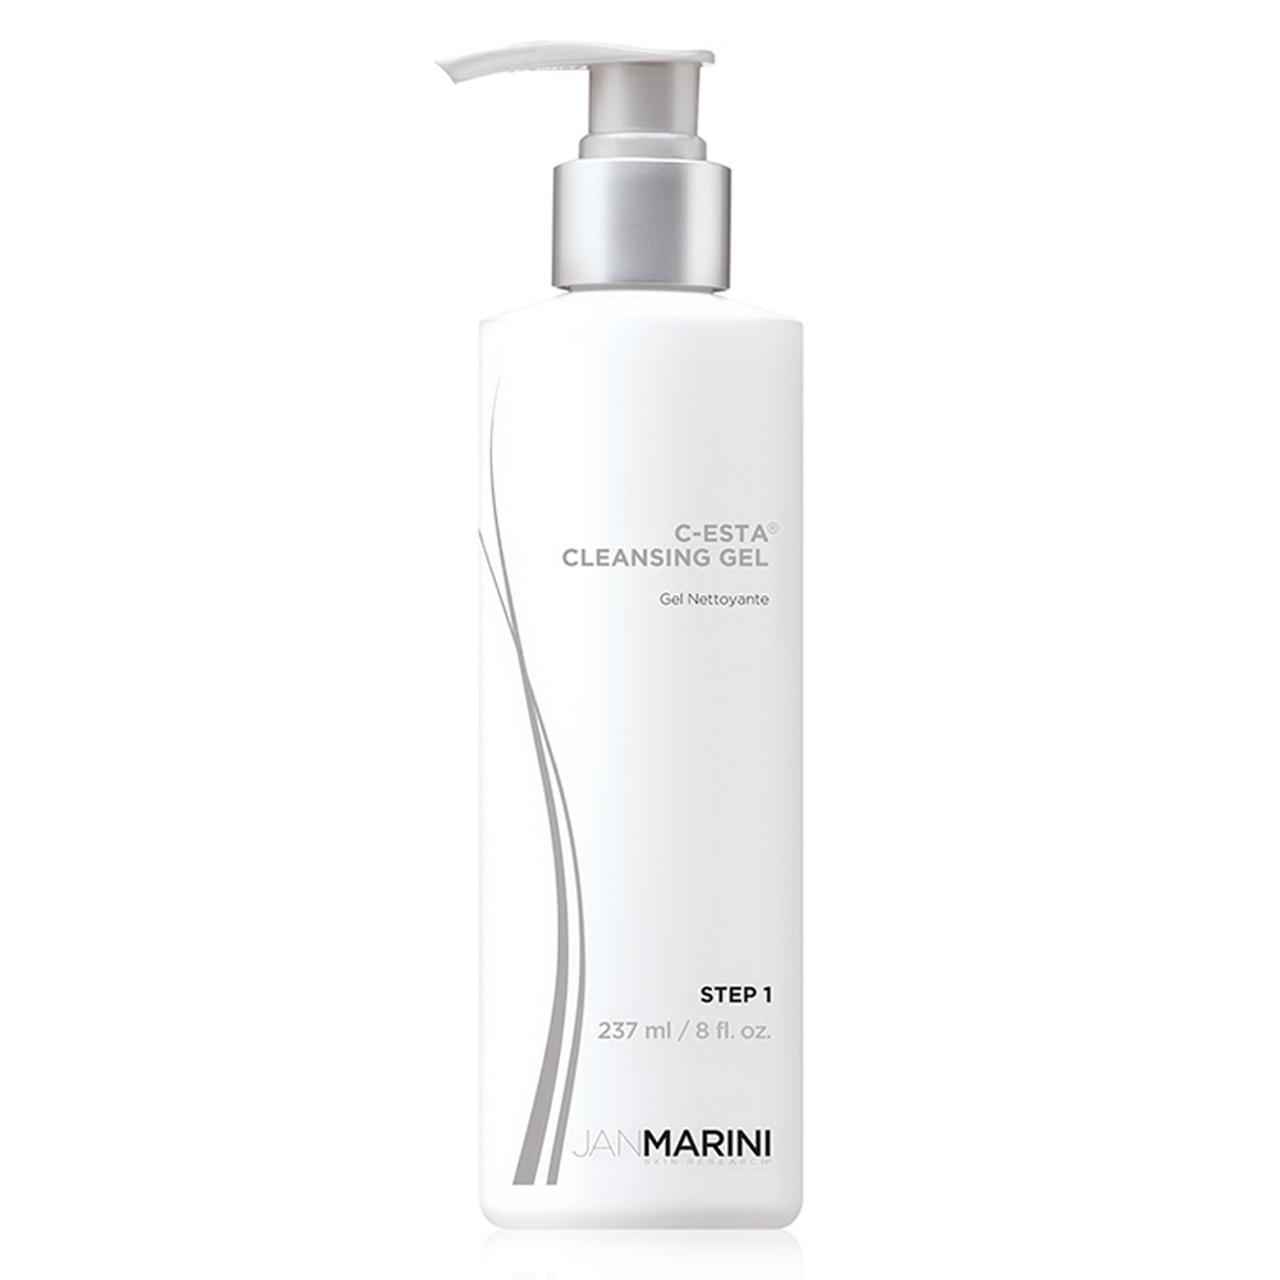 Jan Marini C-ESTA Cleansing Gel BeautifiedYou.com